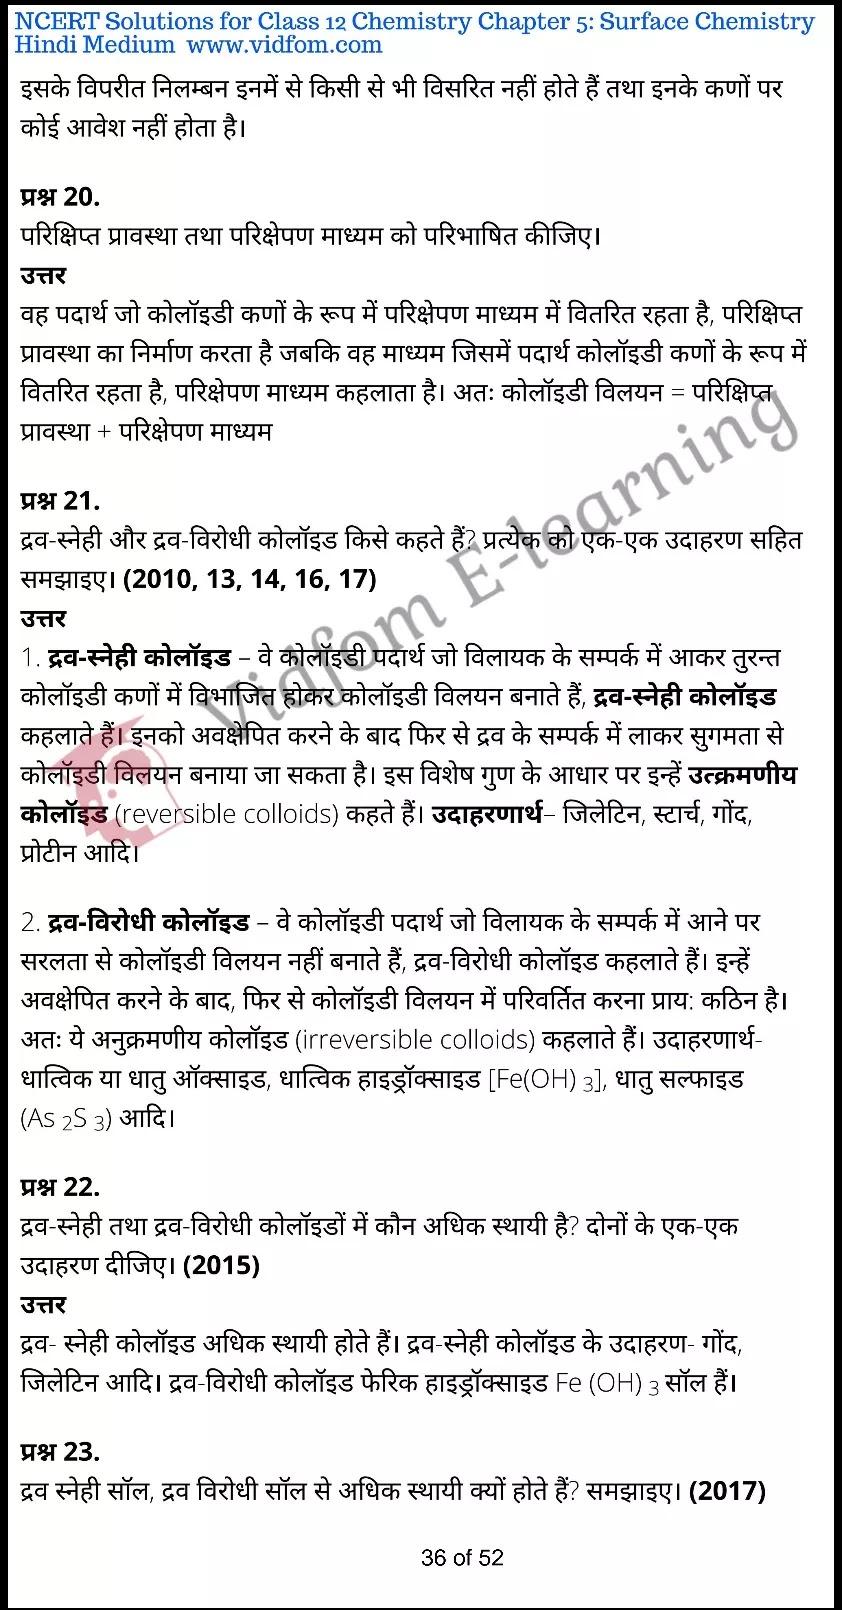 class 12 chemistry chapter 5 light hindi medium 36